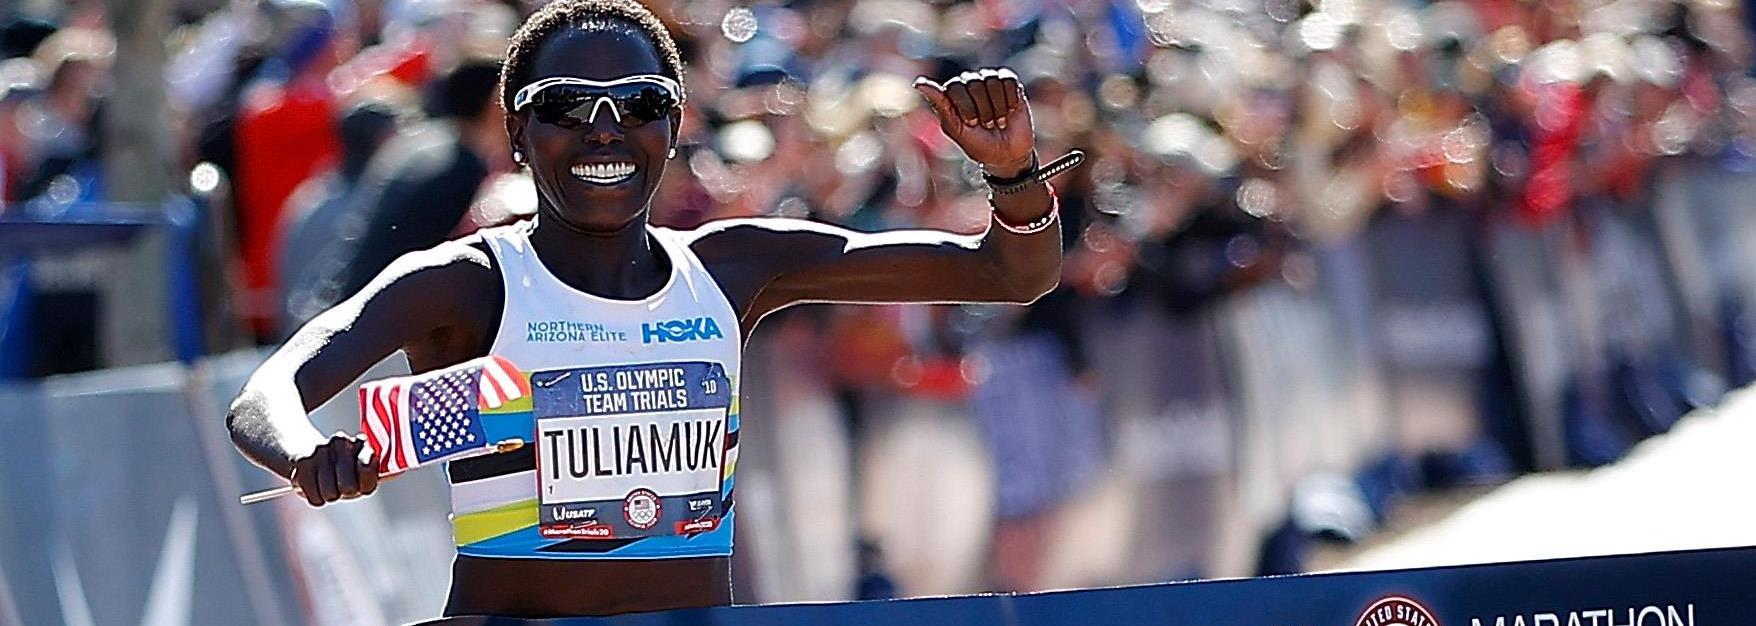 Tuliamuk continues idol Loroupe's running, philanthropic legacy